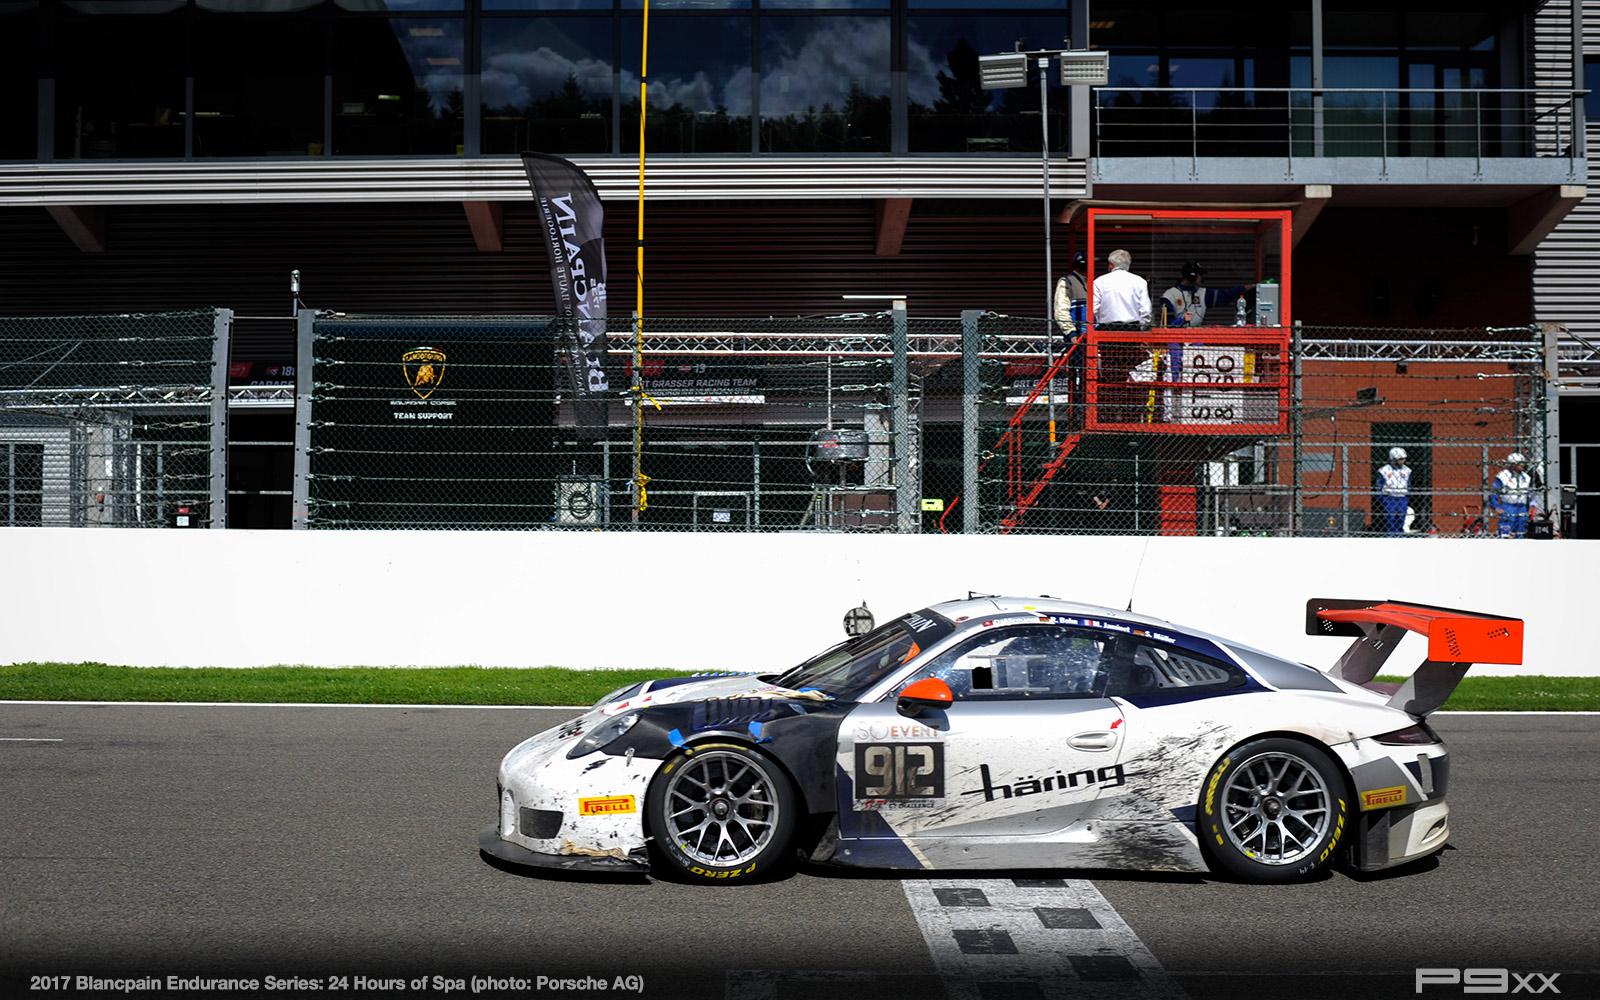 2017-24-Hours-of-Spa-Porsche-383